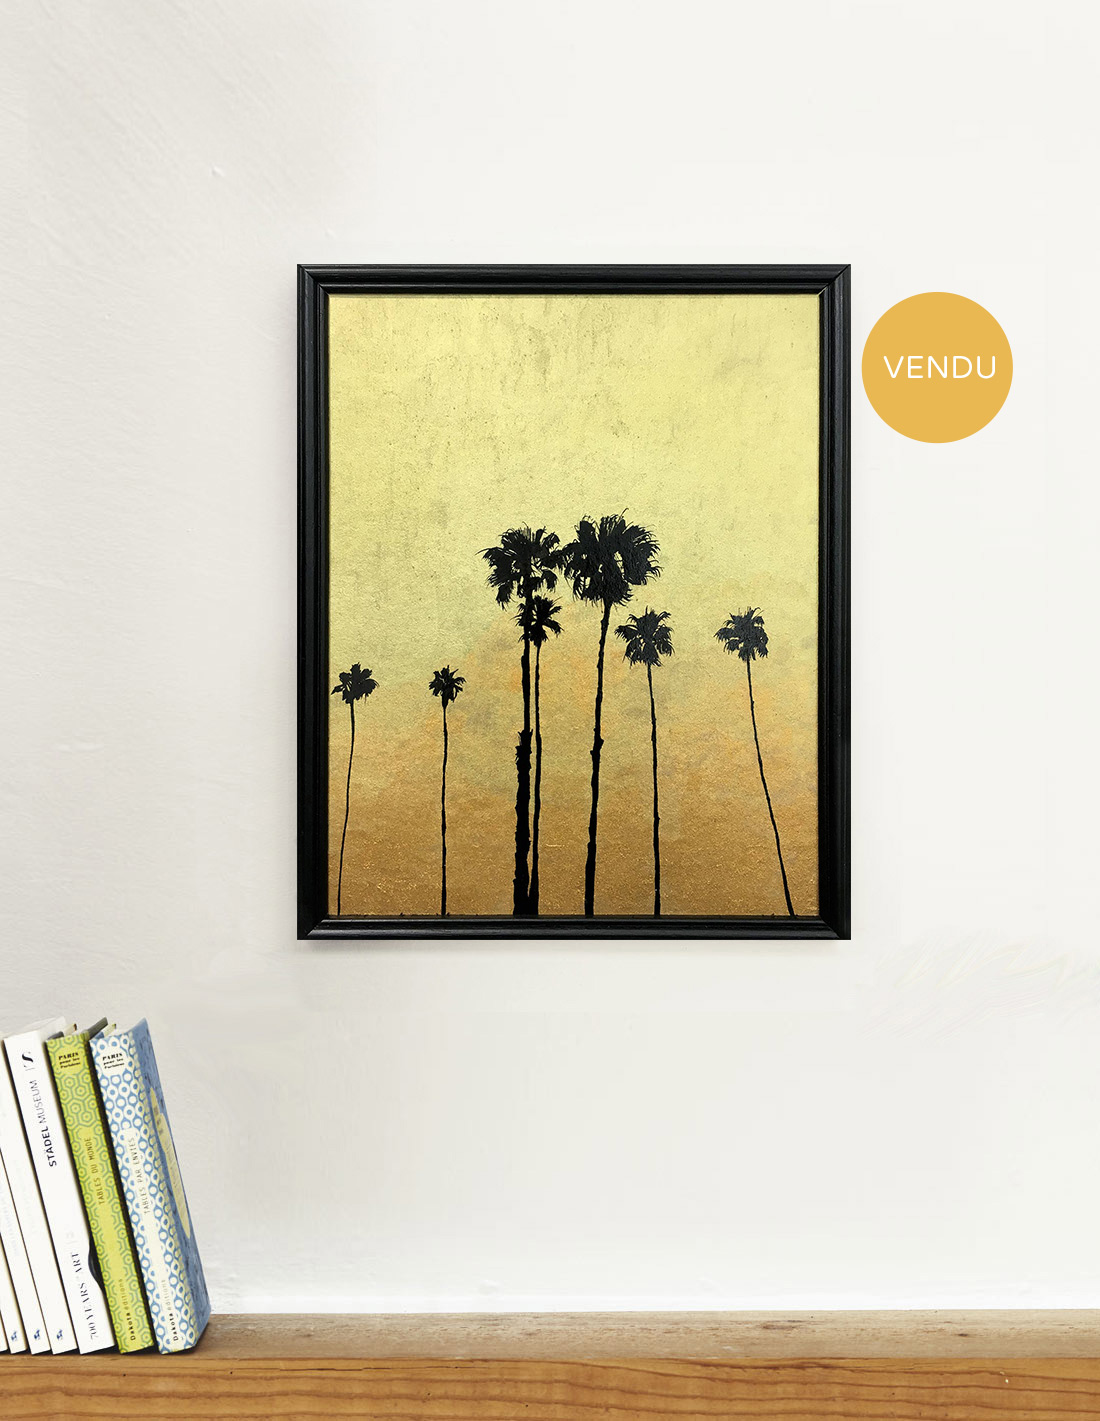 Moyens palmtrees - Tableau - Hubert Jouzeau